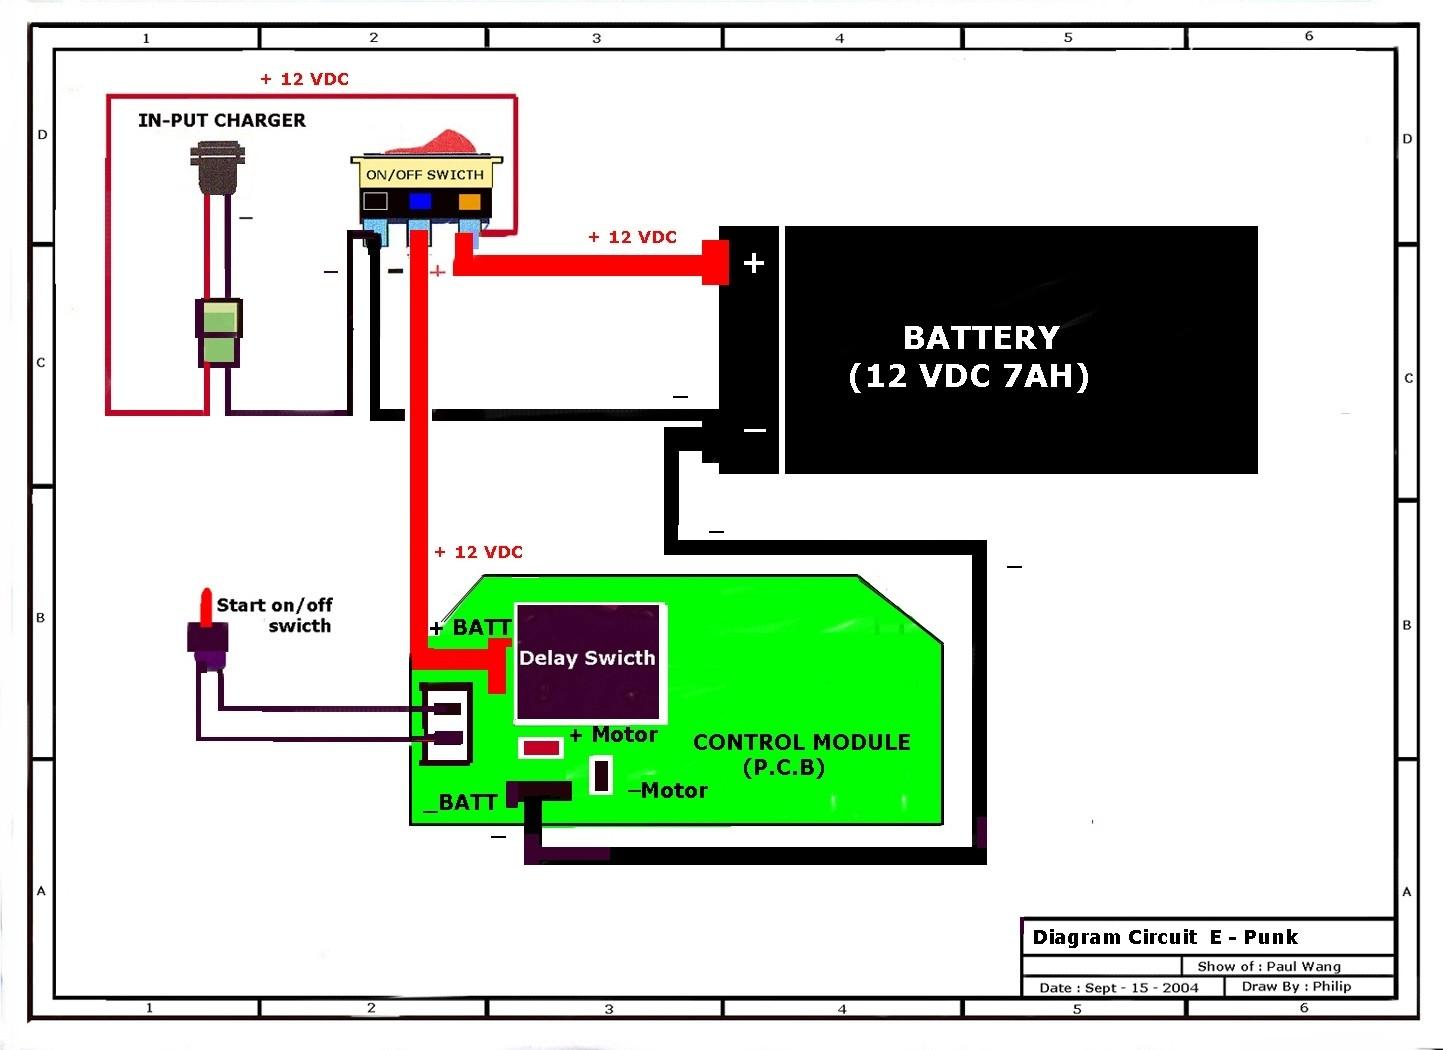 electric bike controller circuit diagram wiring diagram image rh mainetreasurechest com e bike controller circuit diagram electric bike controller circuit diagram